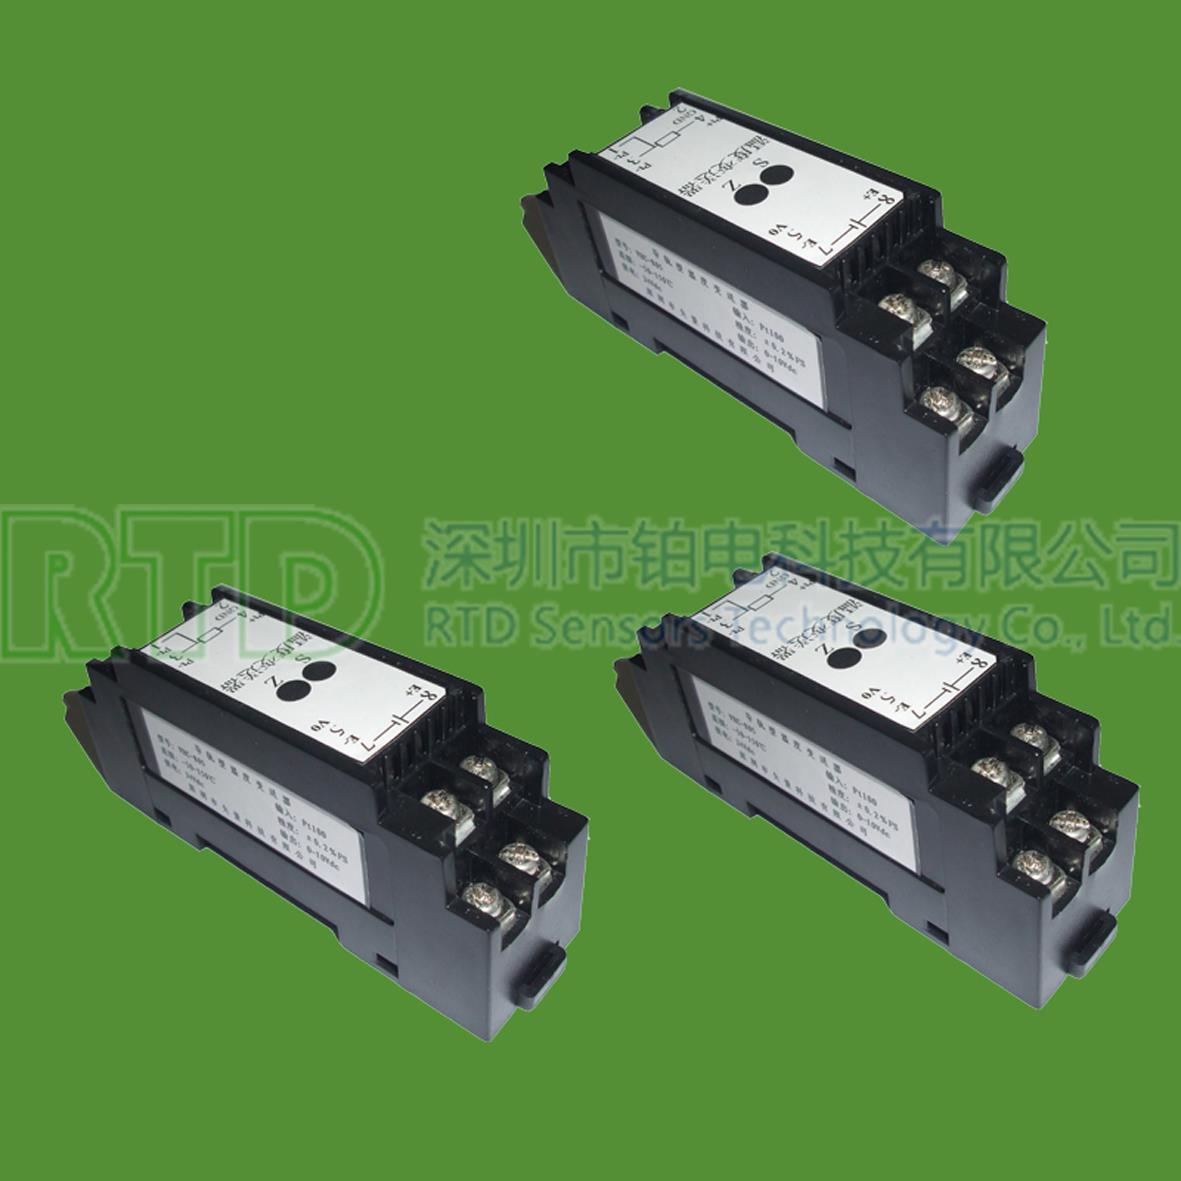 BD-805导轨式热电阻温度变送器模块是专为热电阻(Pt100,Pt1000, Cu50, Cu100)温度传感器配套的标准信号输出模块。该模块属本安防爆型,带电源反接保护及温度传感器开路报警输出功能。